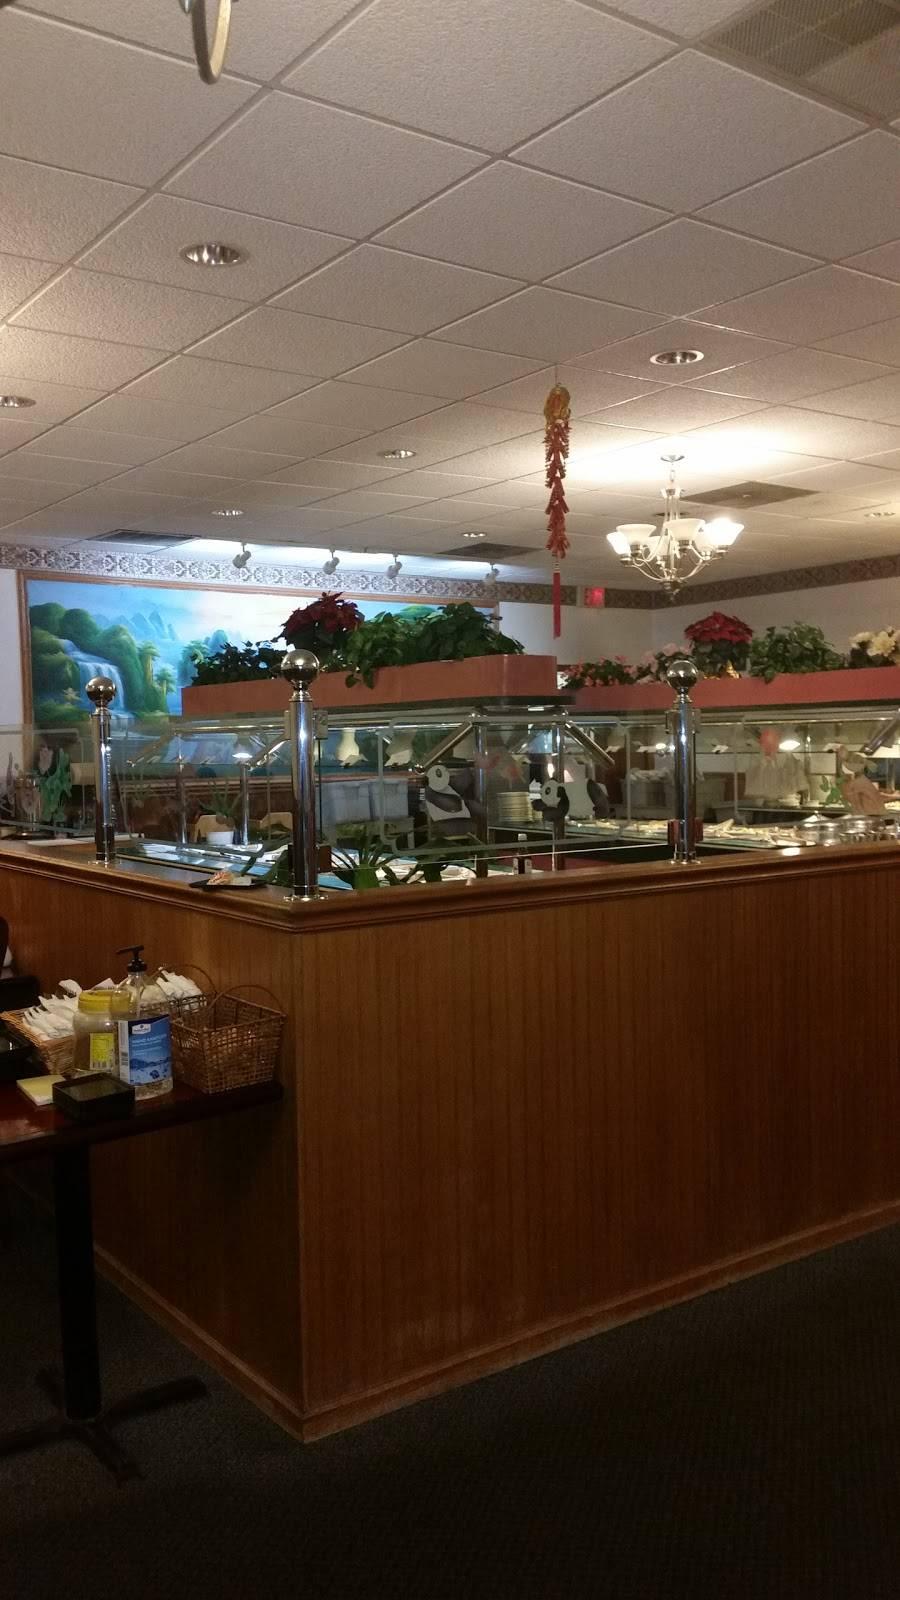 China Wok | restaurant | 204 S Century Ave, Waunakee, WI 53597, USA | 6088499638 OR +1 608-849-9638